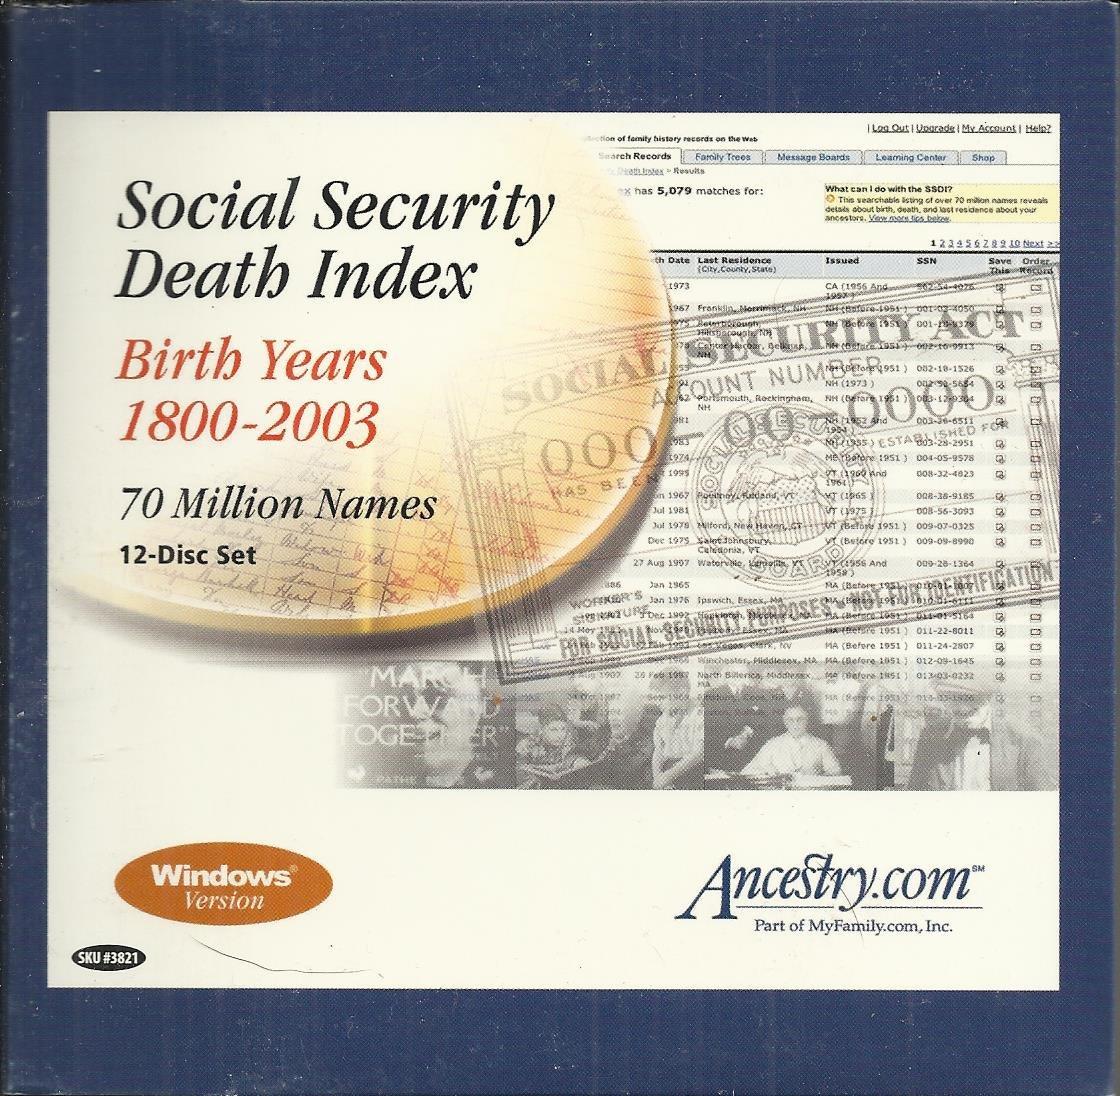 u s social security death index